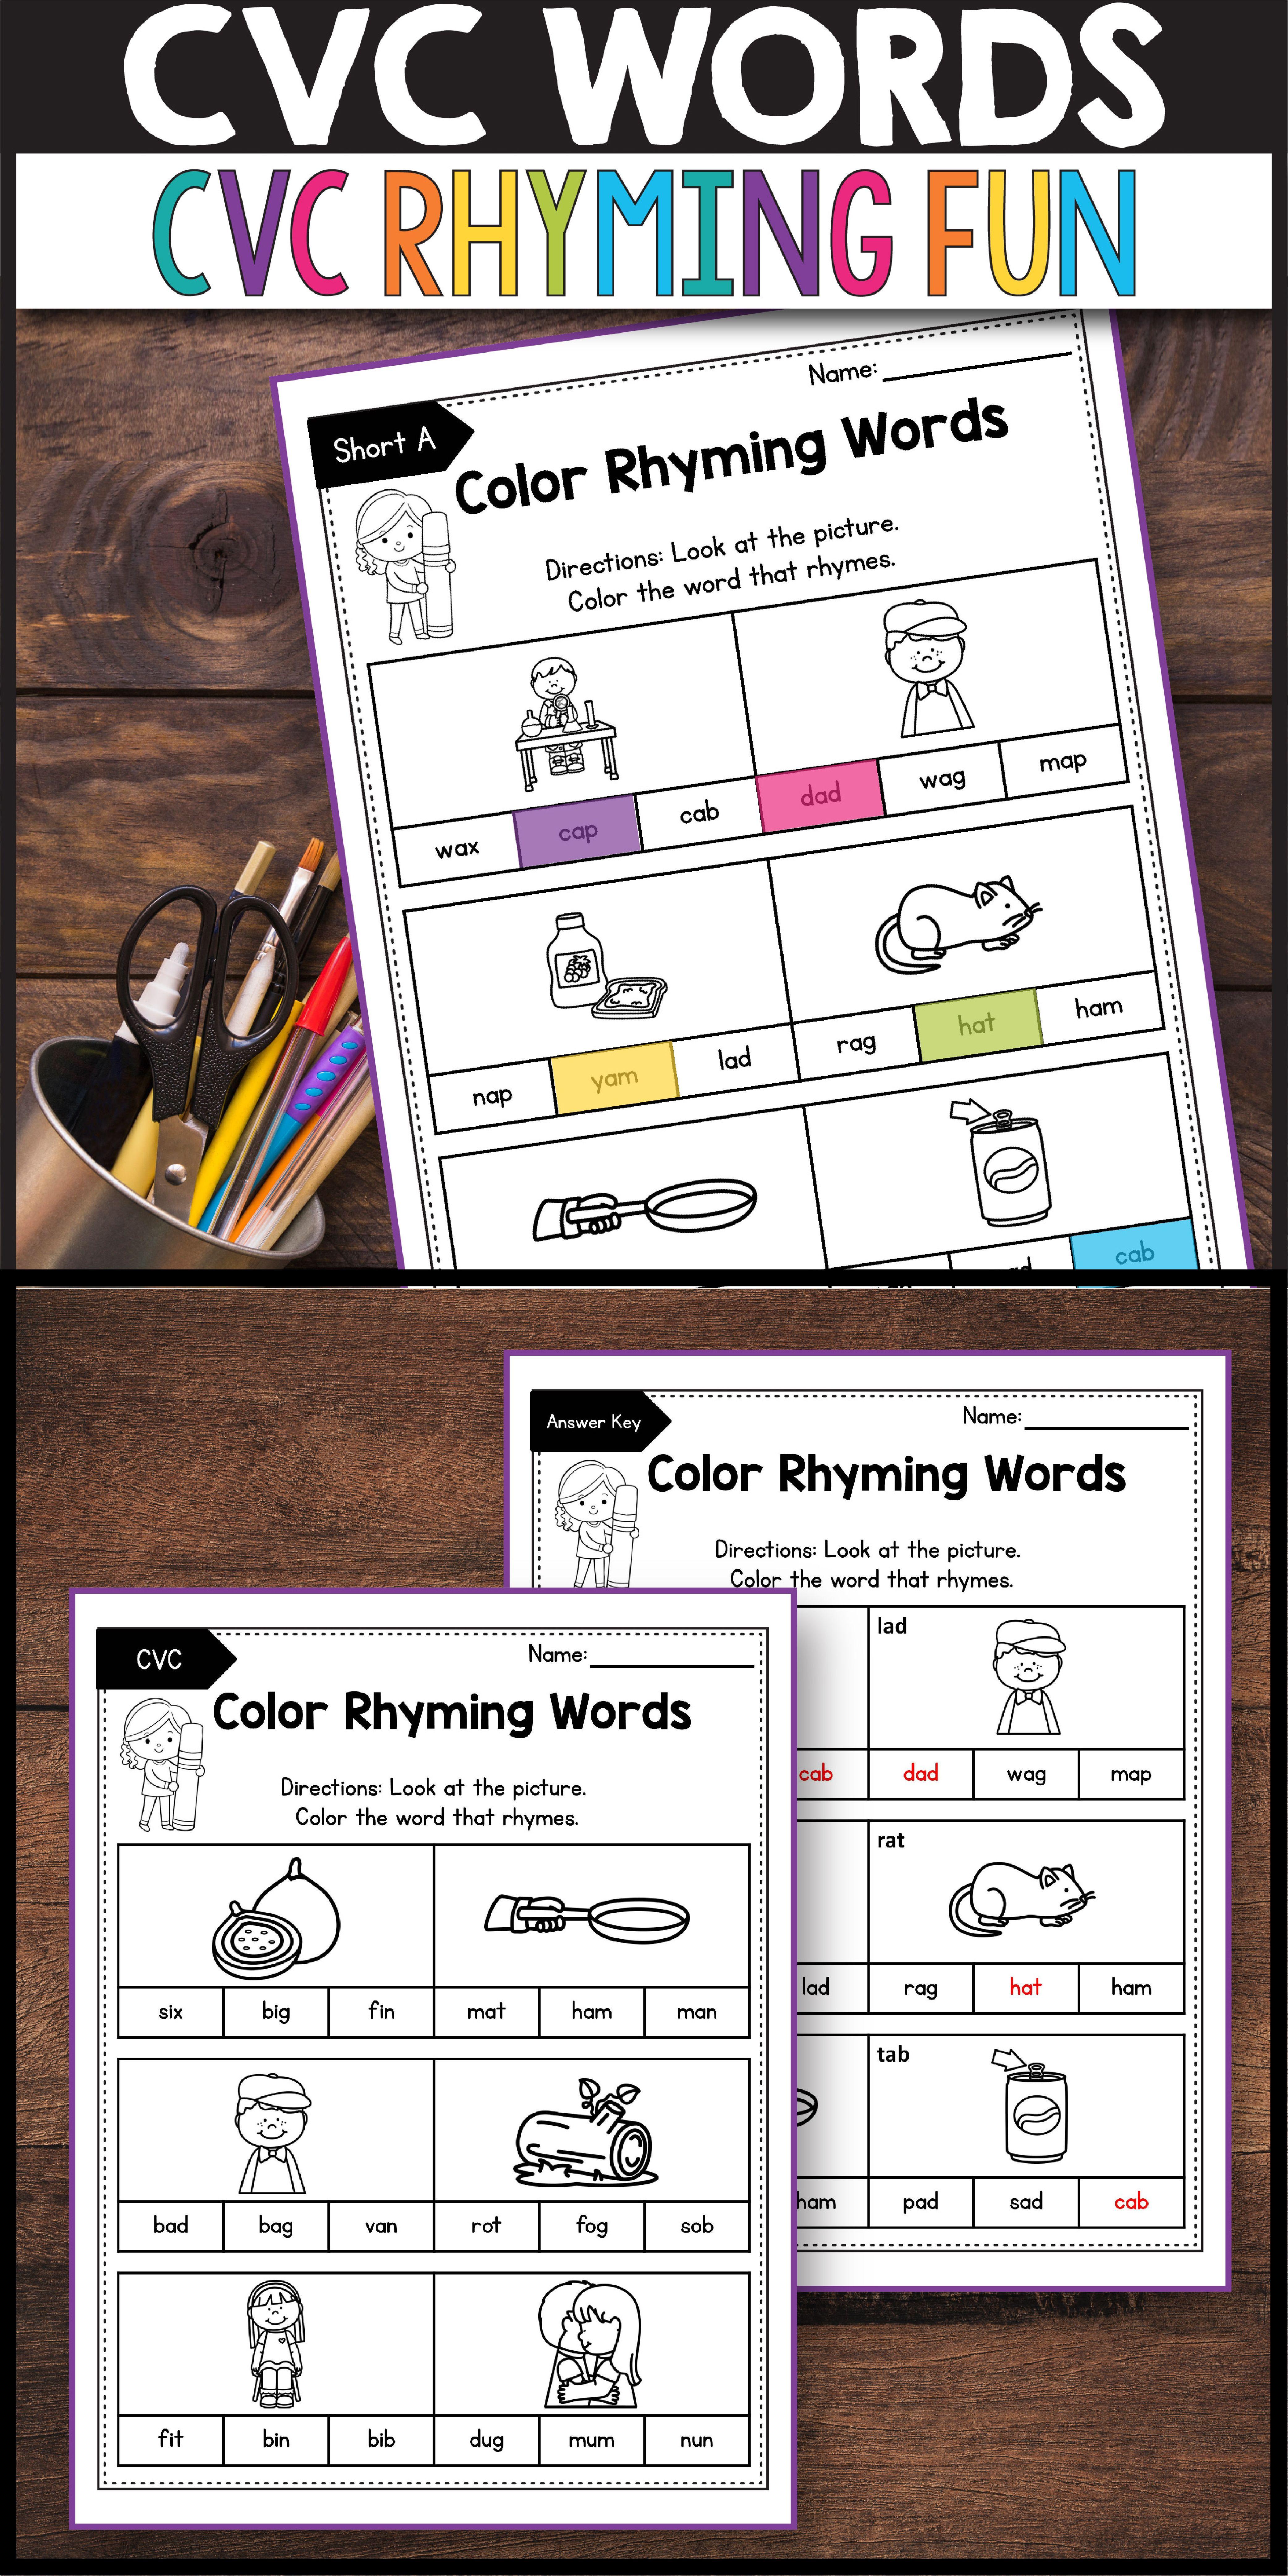 Blending Cvc Words Flashcards And Worksheets Cvc Words Cvc Words Worksheets Cvc Words Kindergarten [ 8334 x 4168 Pixel ]